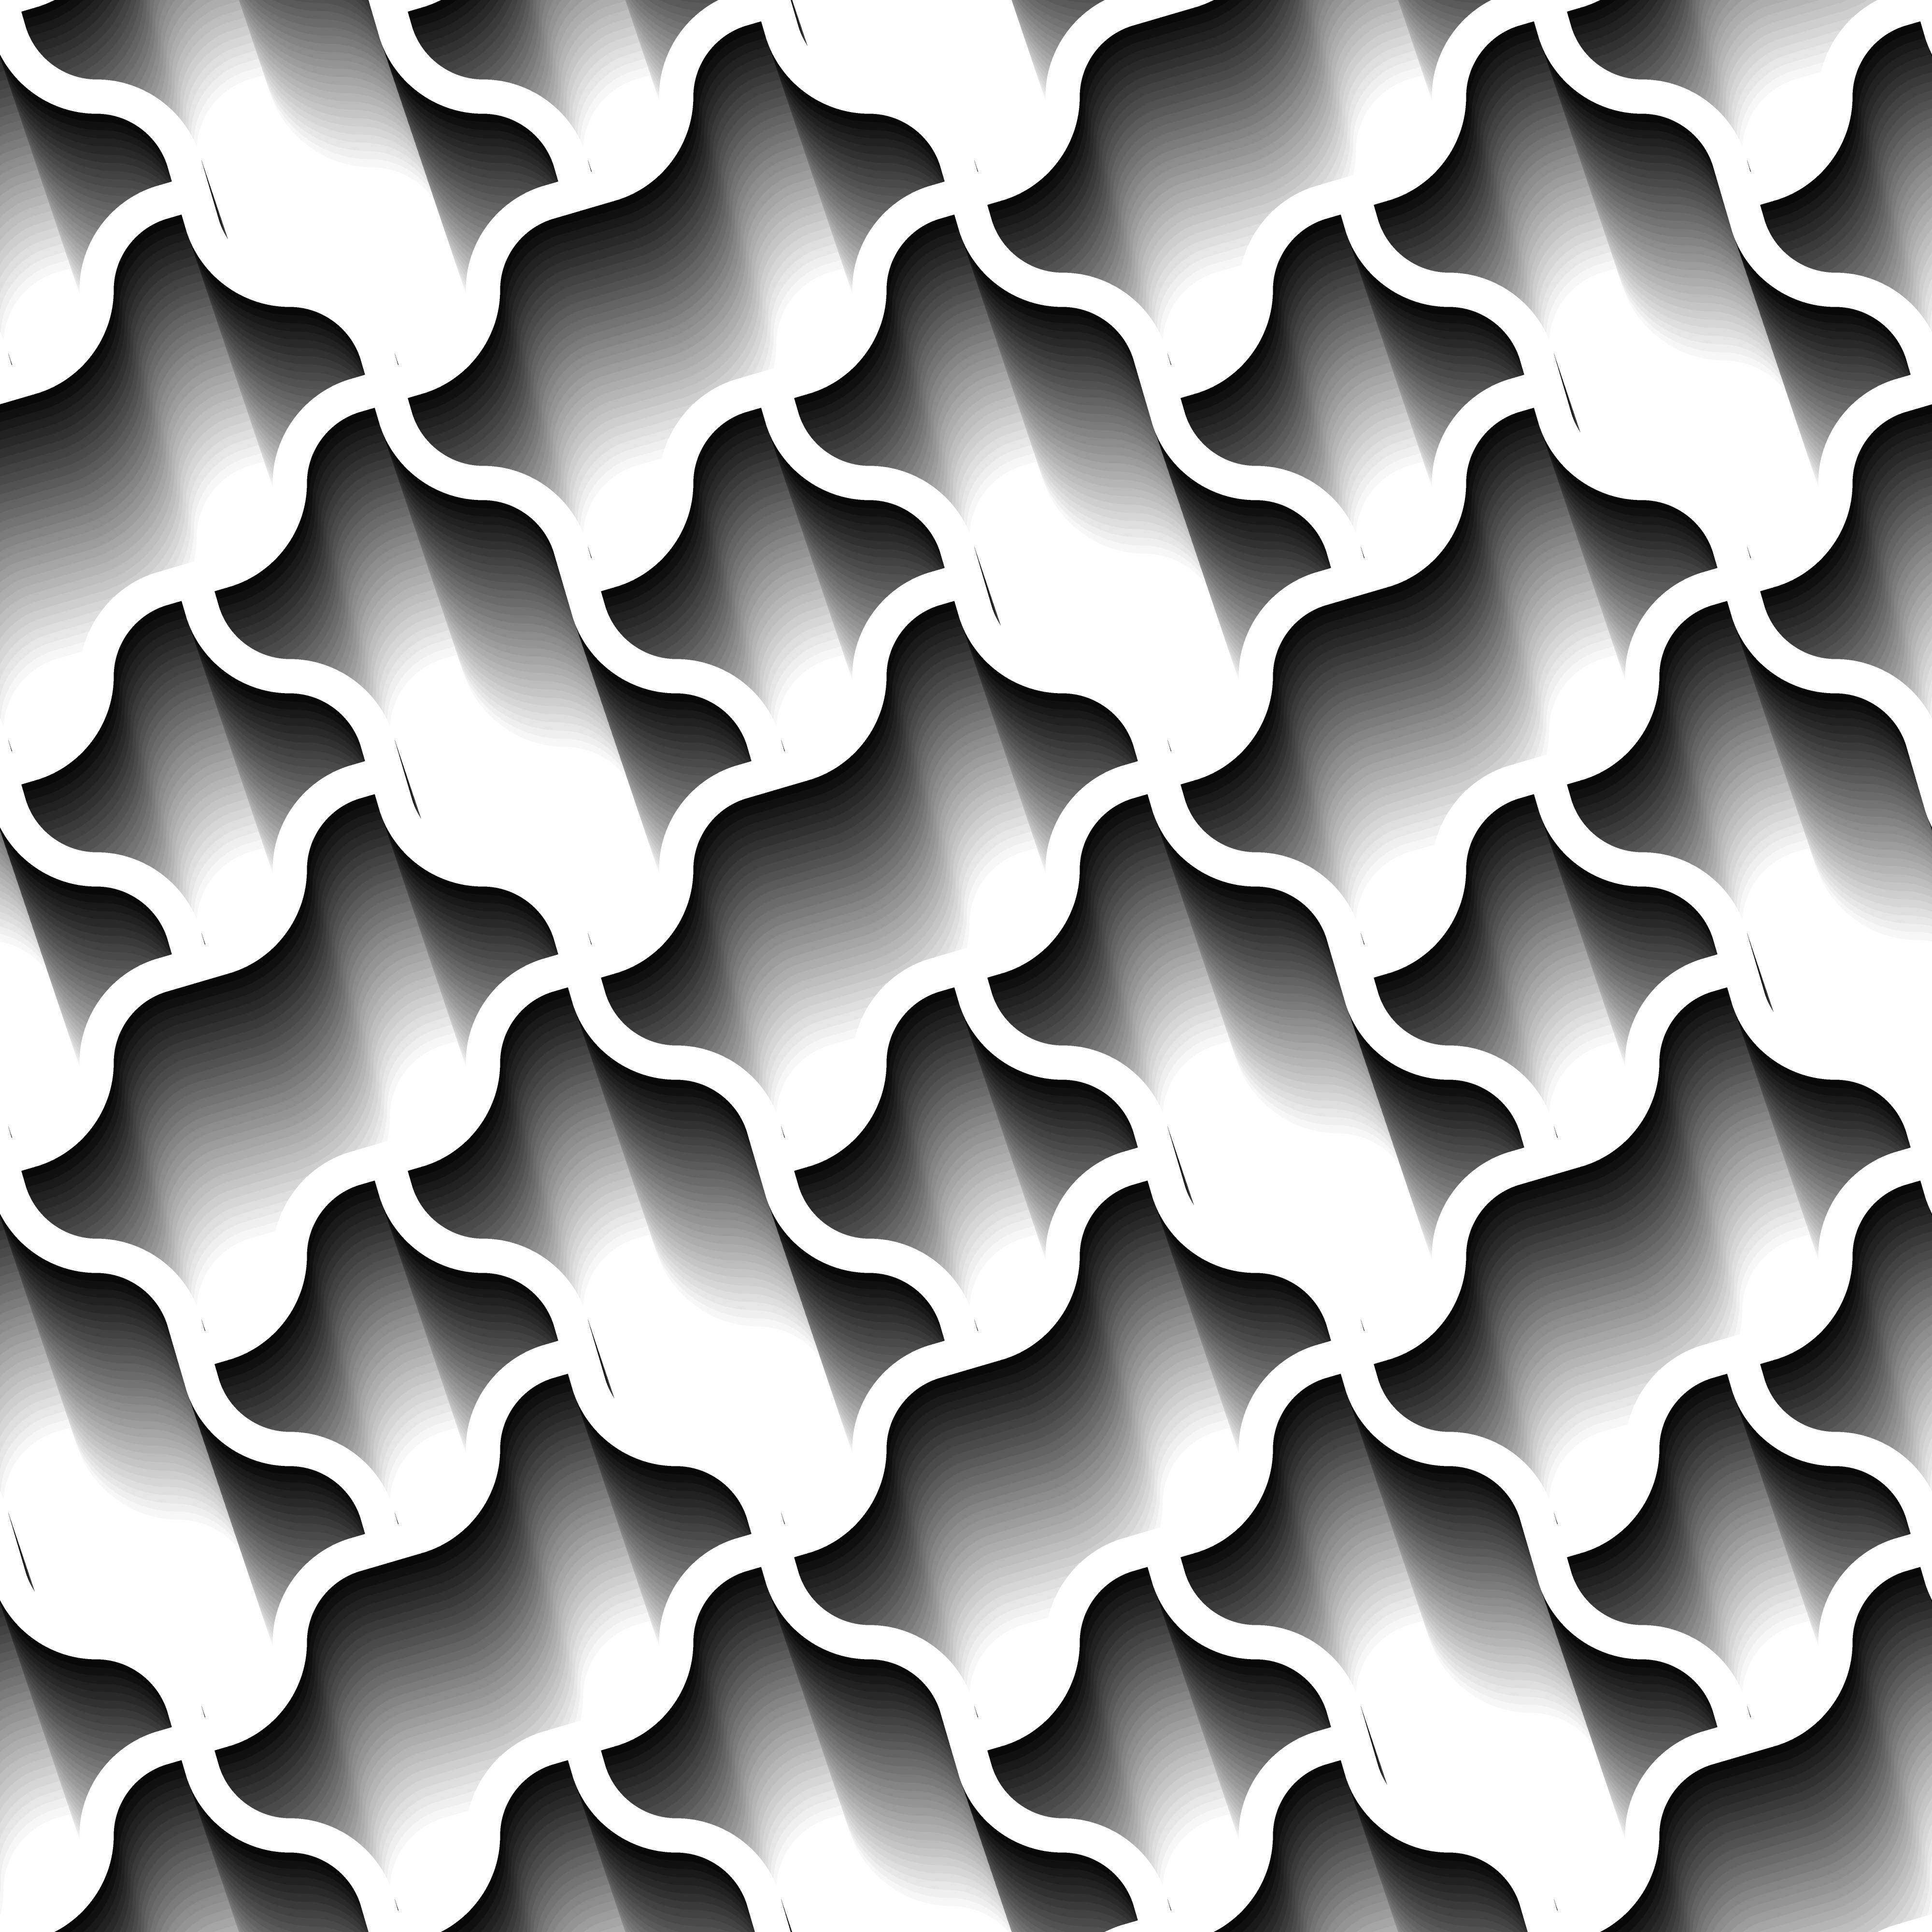 Seamless Abstract Geometric Pattern, Prame Border